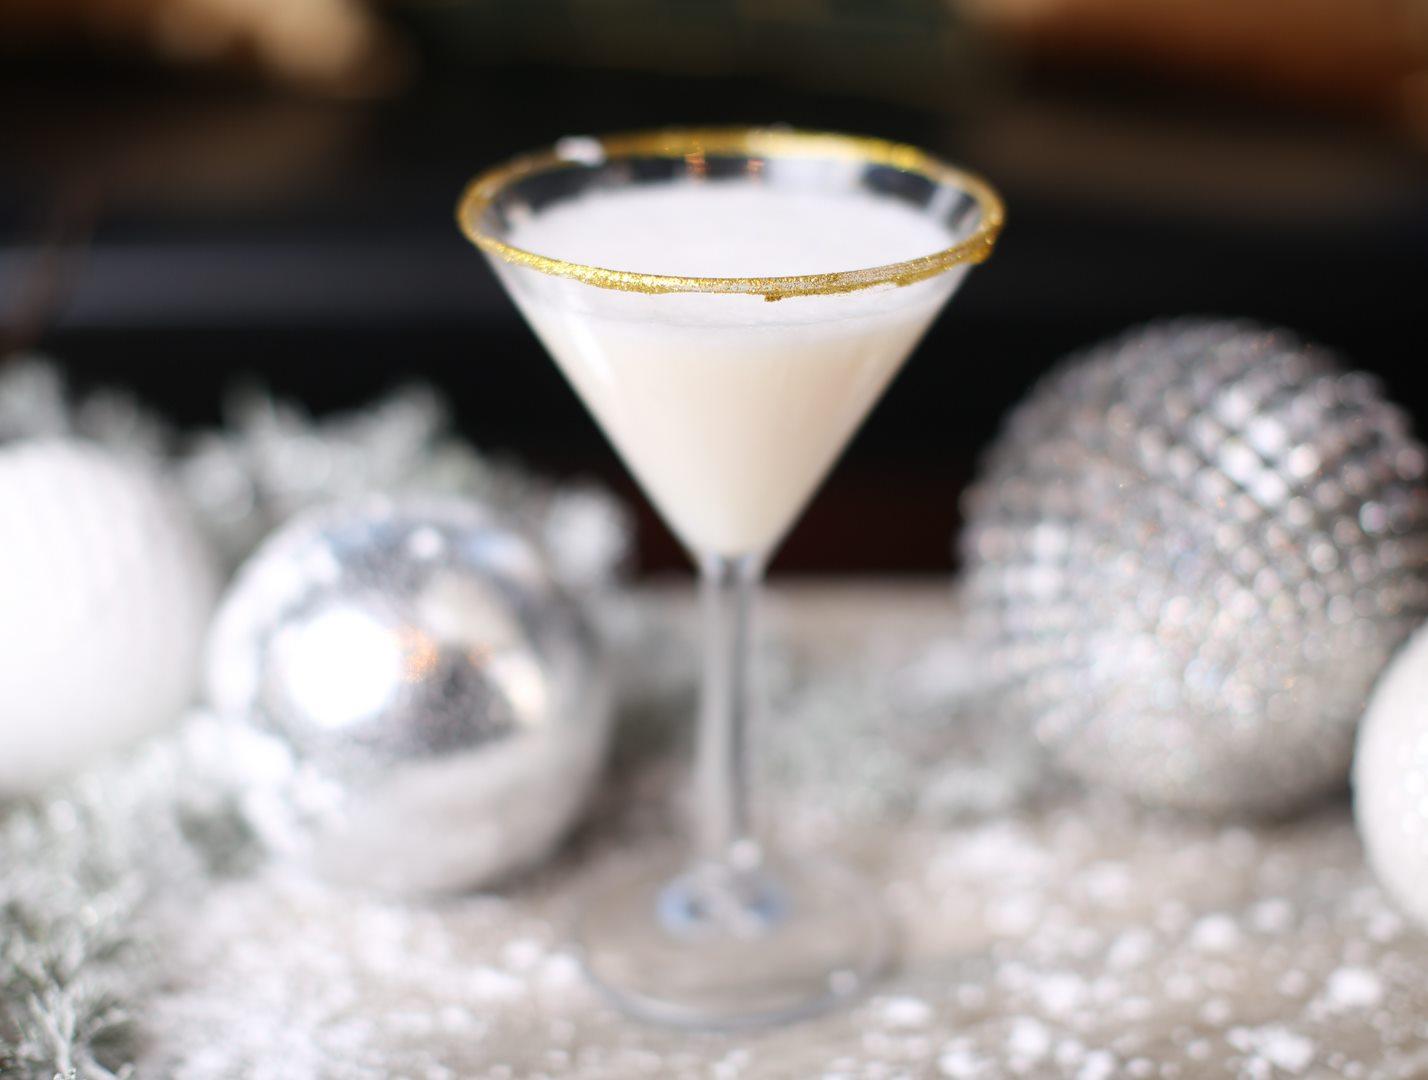 PHD Terrace at Dream Midtown Goldtini martini